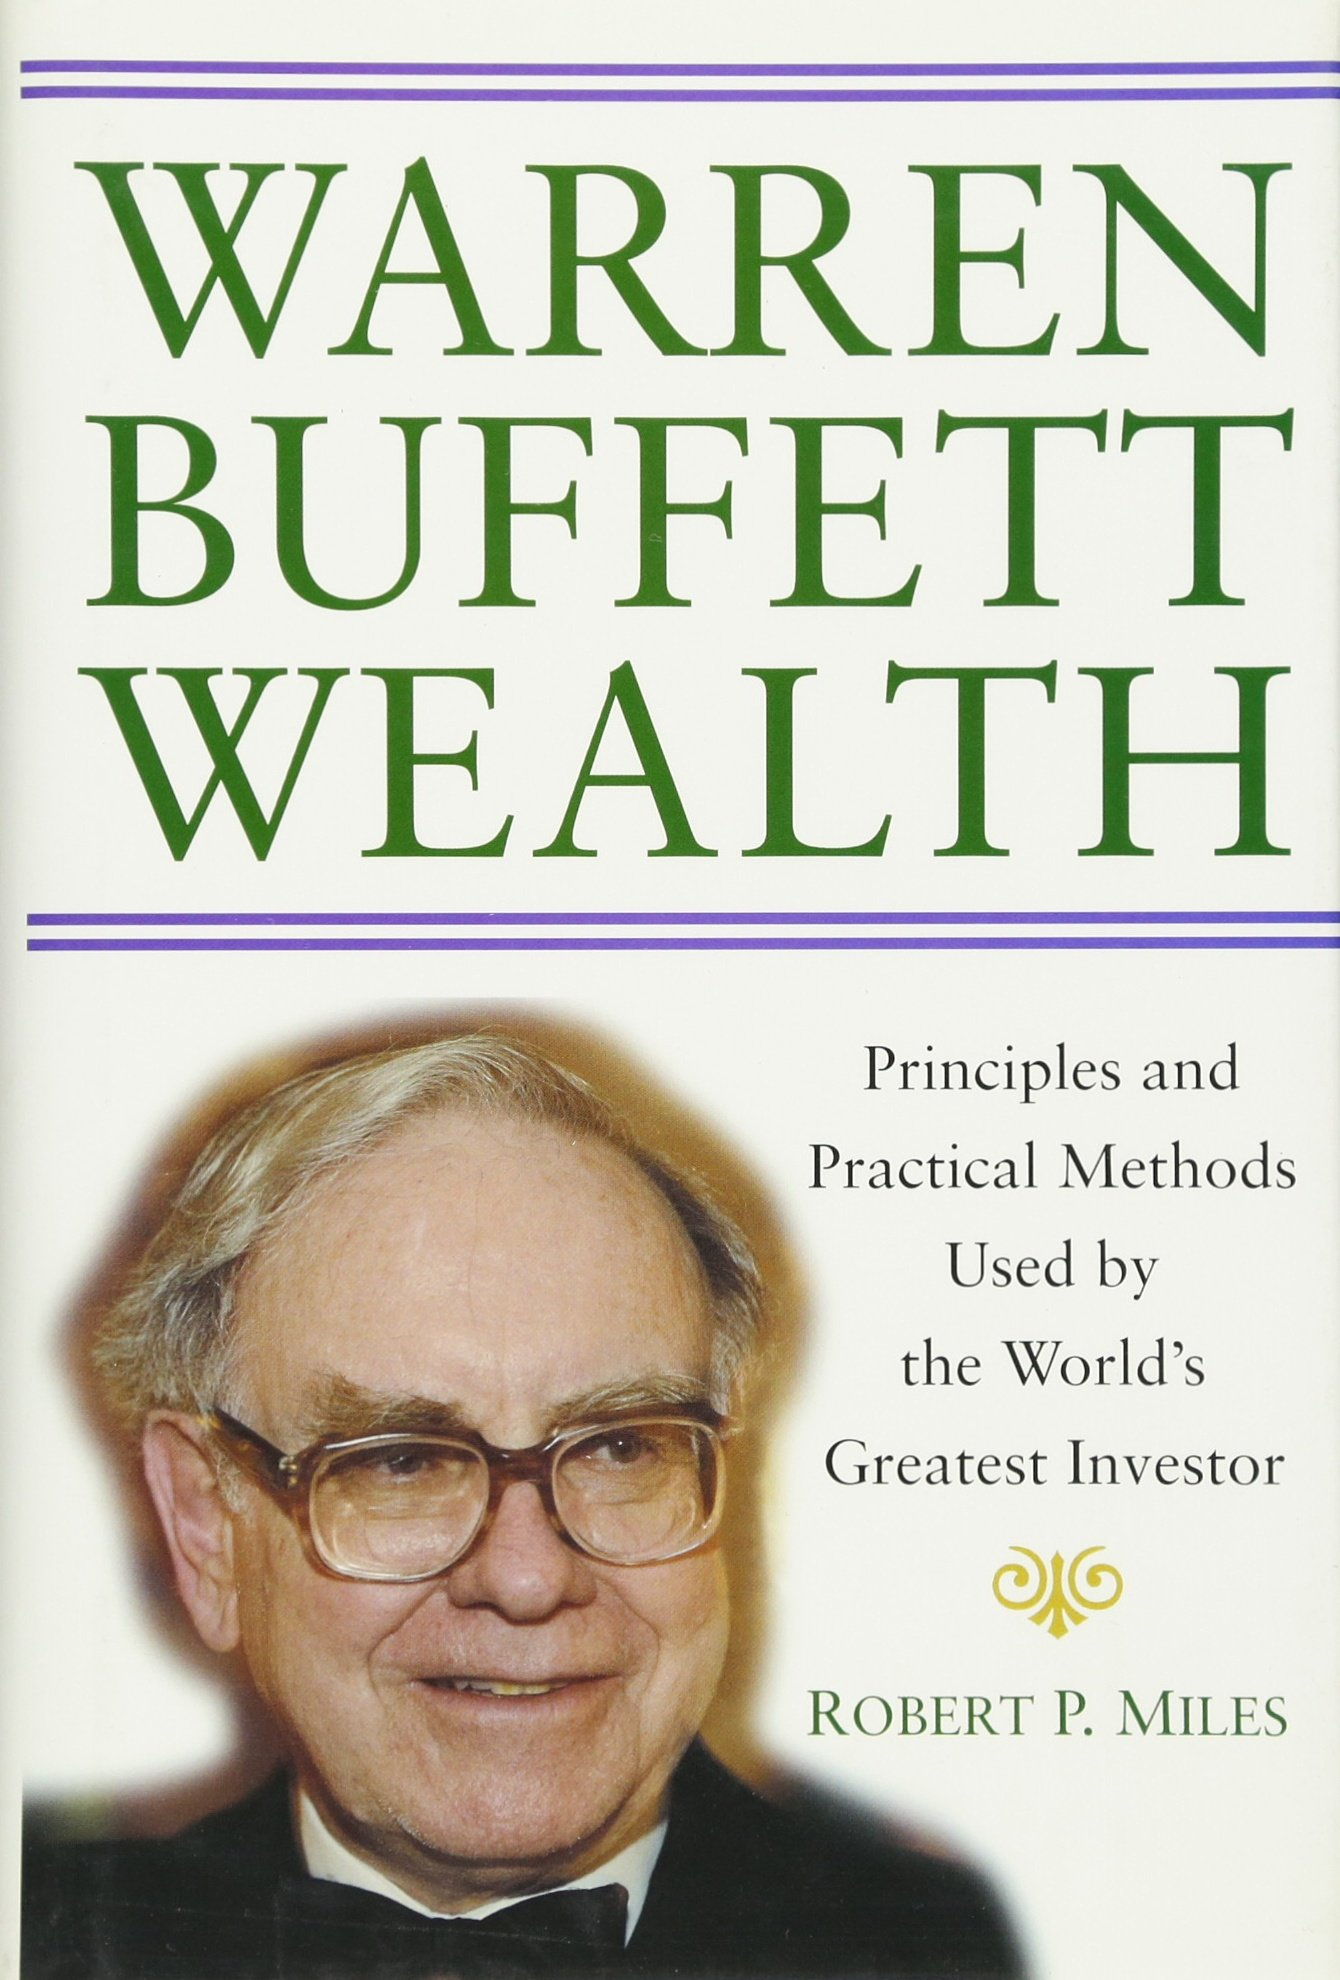 Groovy Warren Buffett Wealth Principles And Practical Methods Used Download Free Architecture Designs Scobabritishbridgeorg